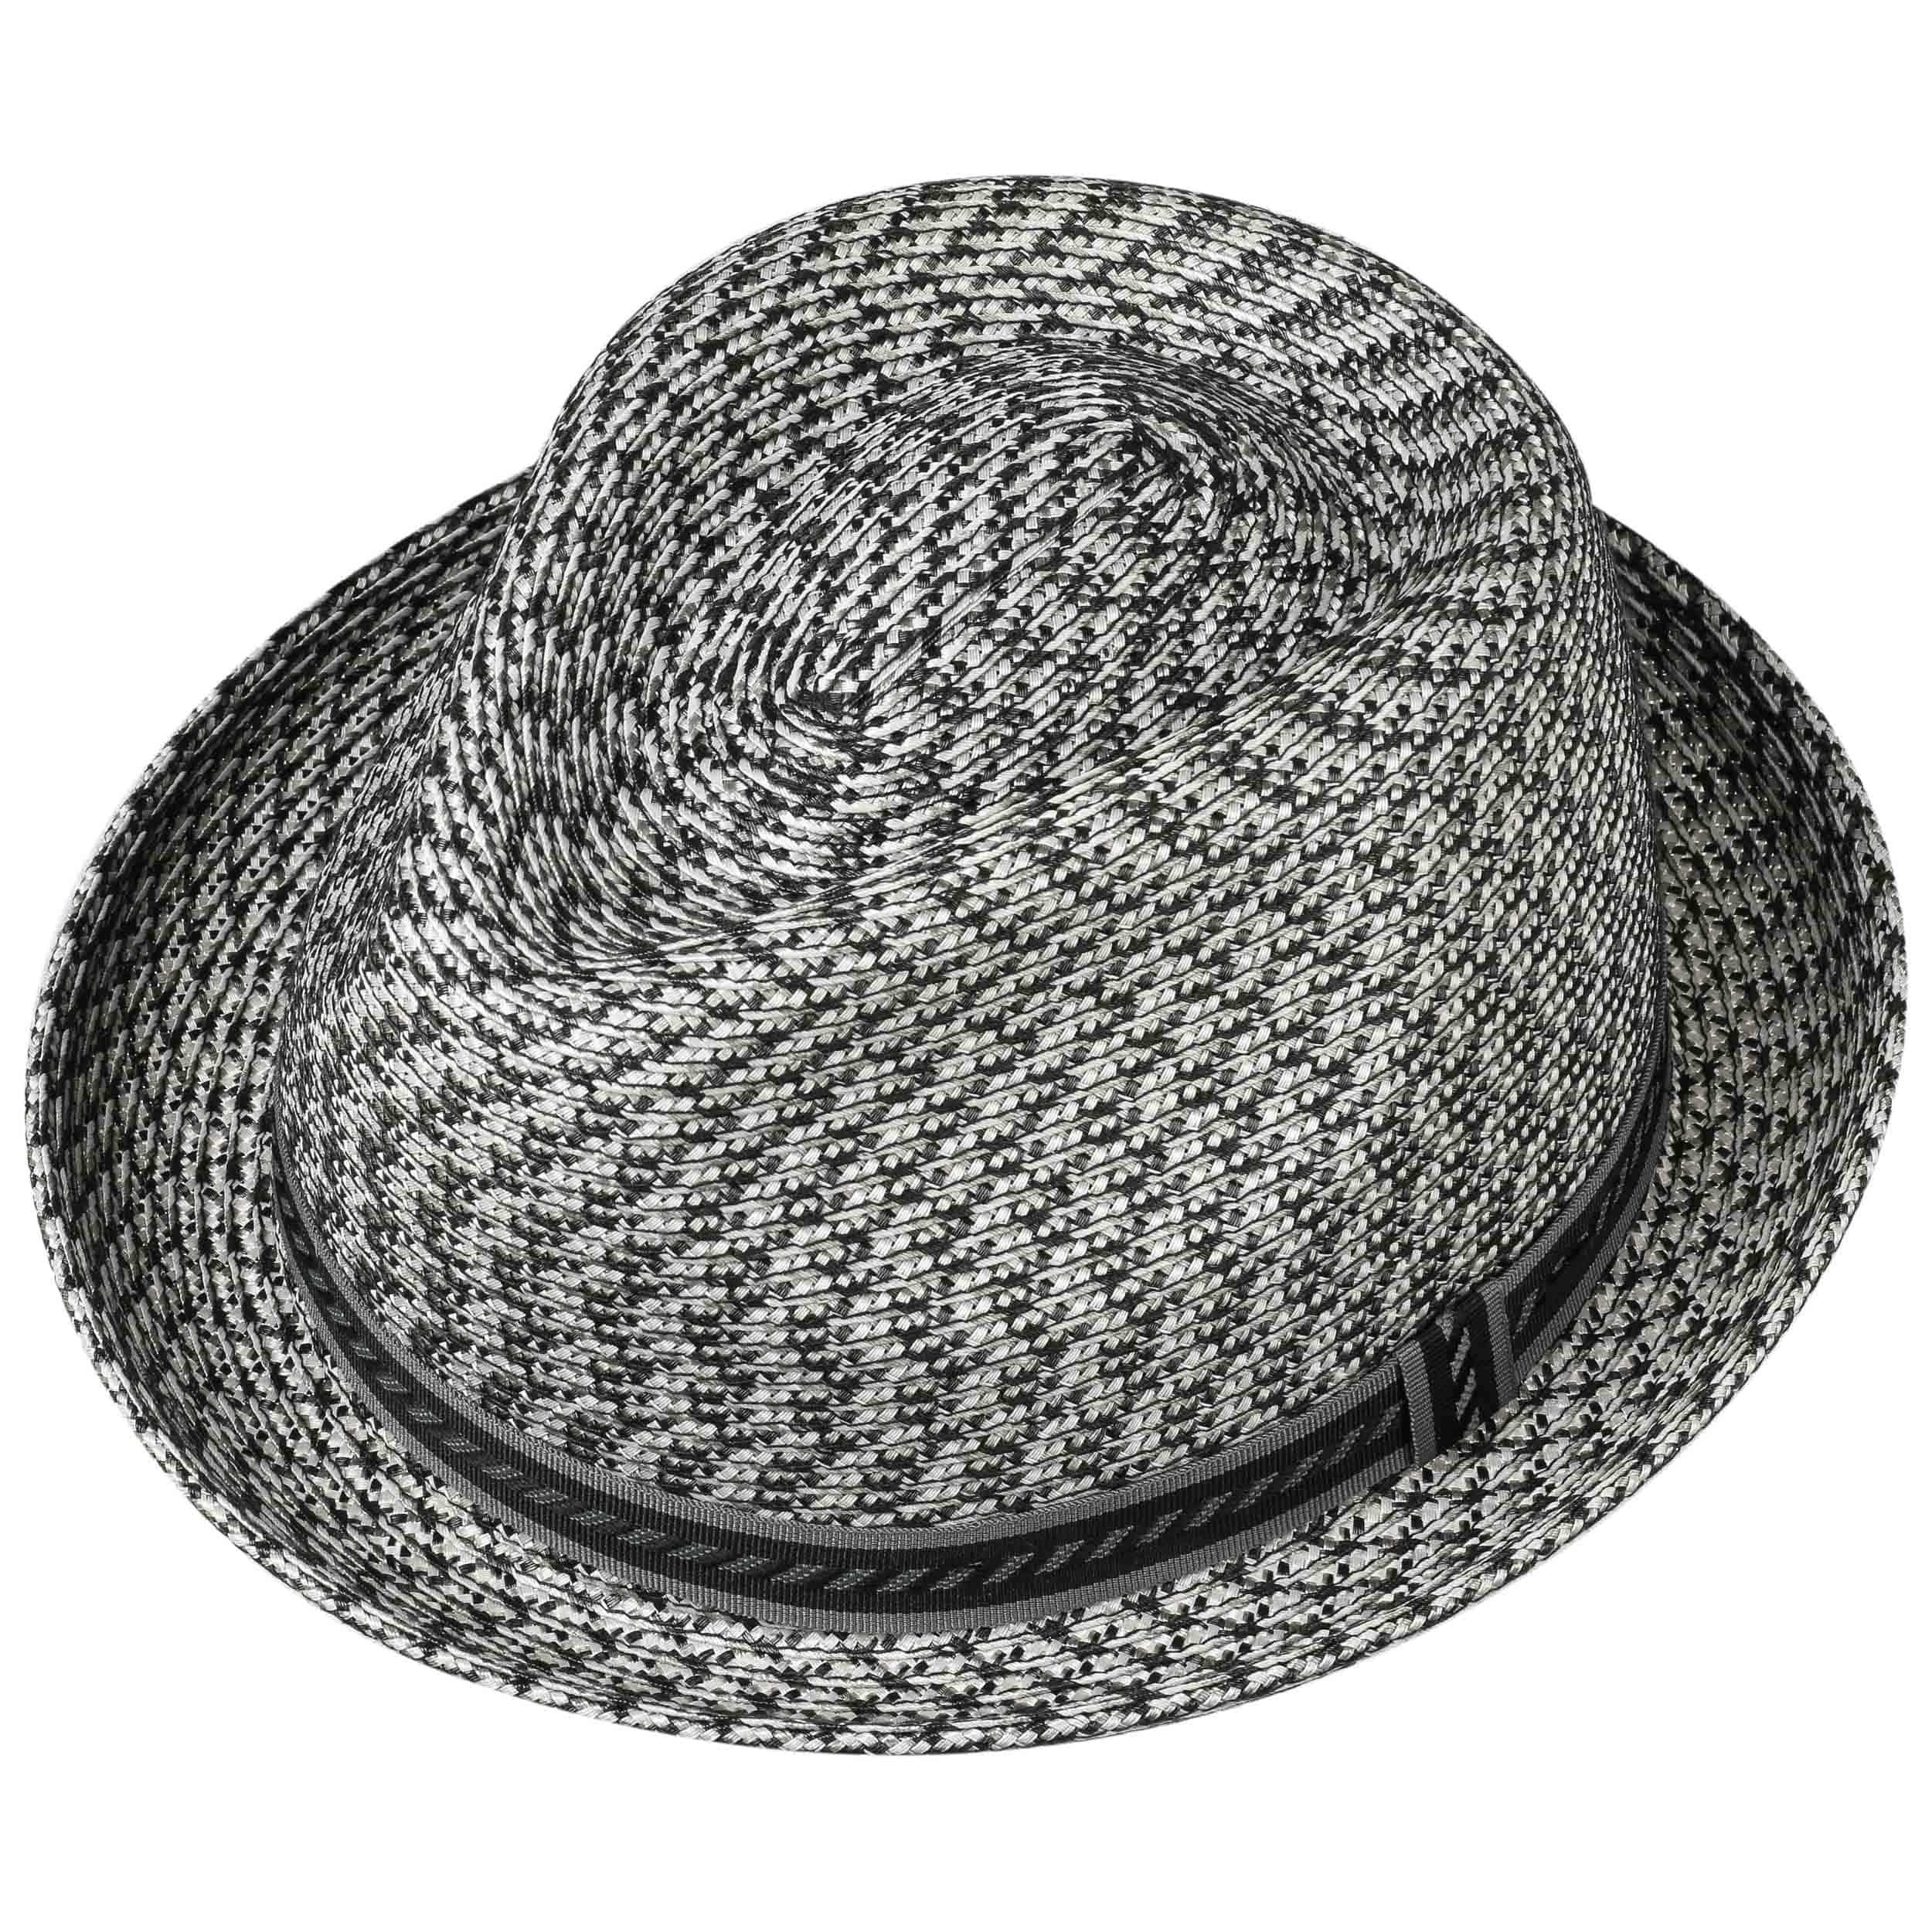 ... Mannes Summer Hat by Bailey of Hollywood - grey 1 ... 9540a813fef